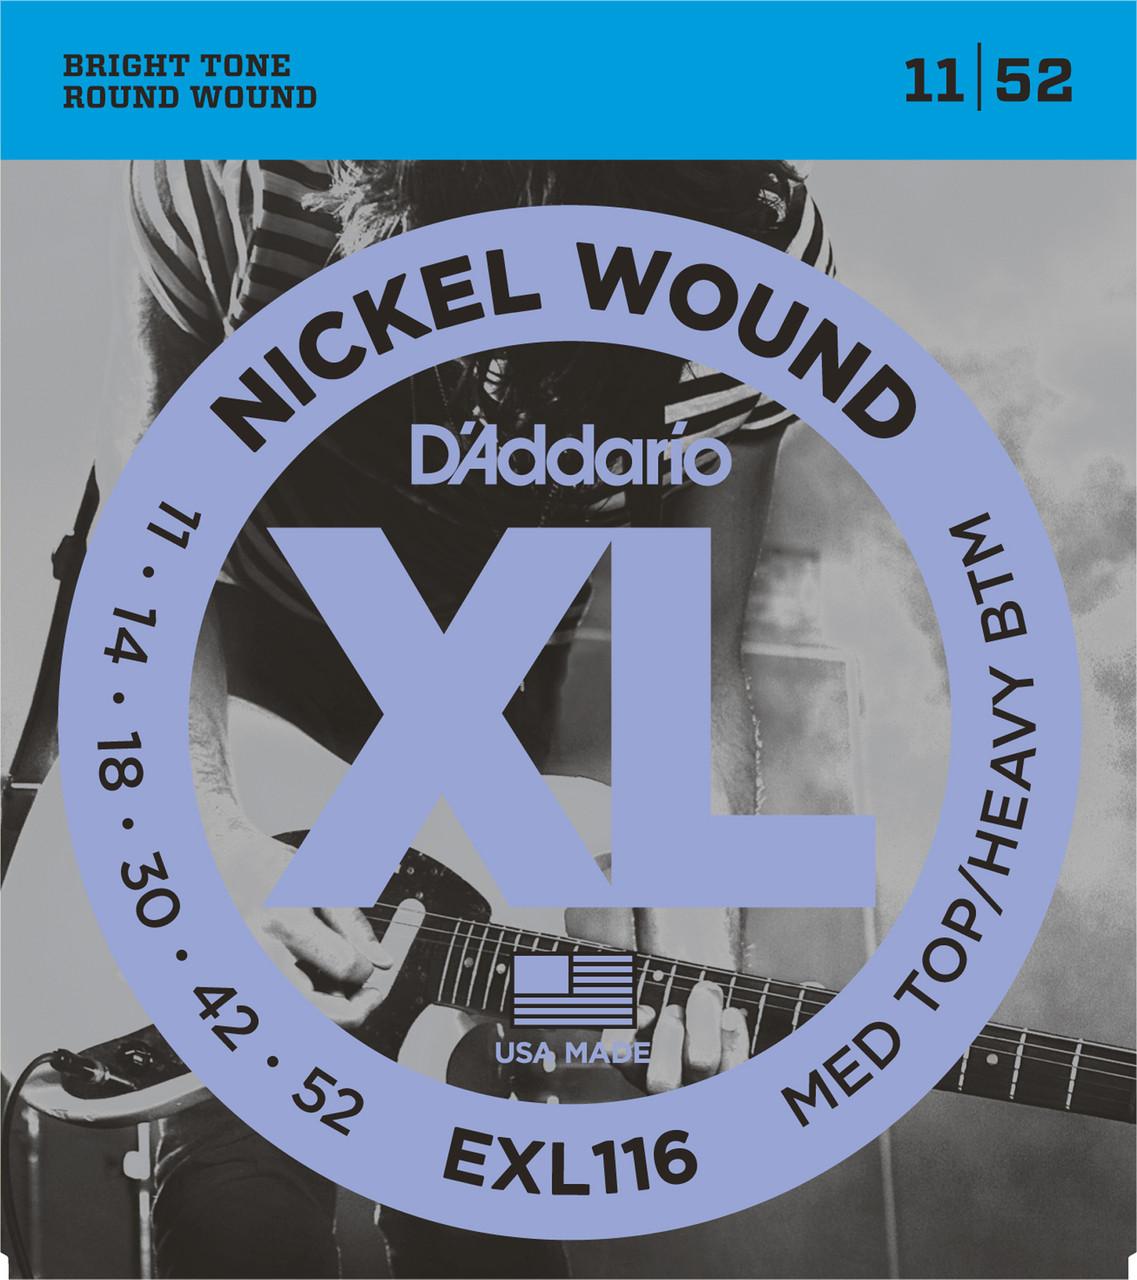 D'addario EXL116 Electric Guitar Strings (11-52)